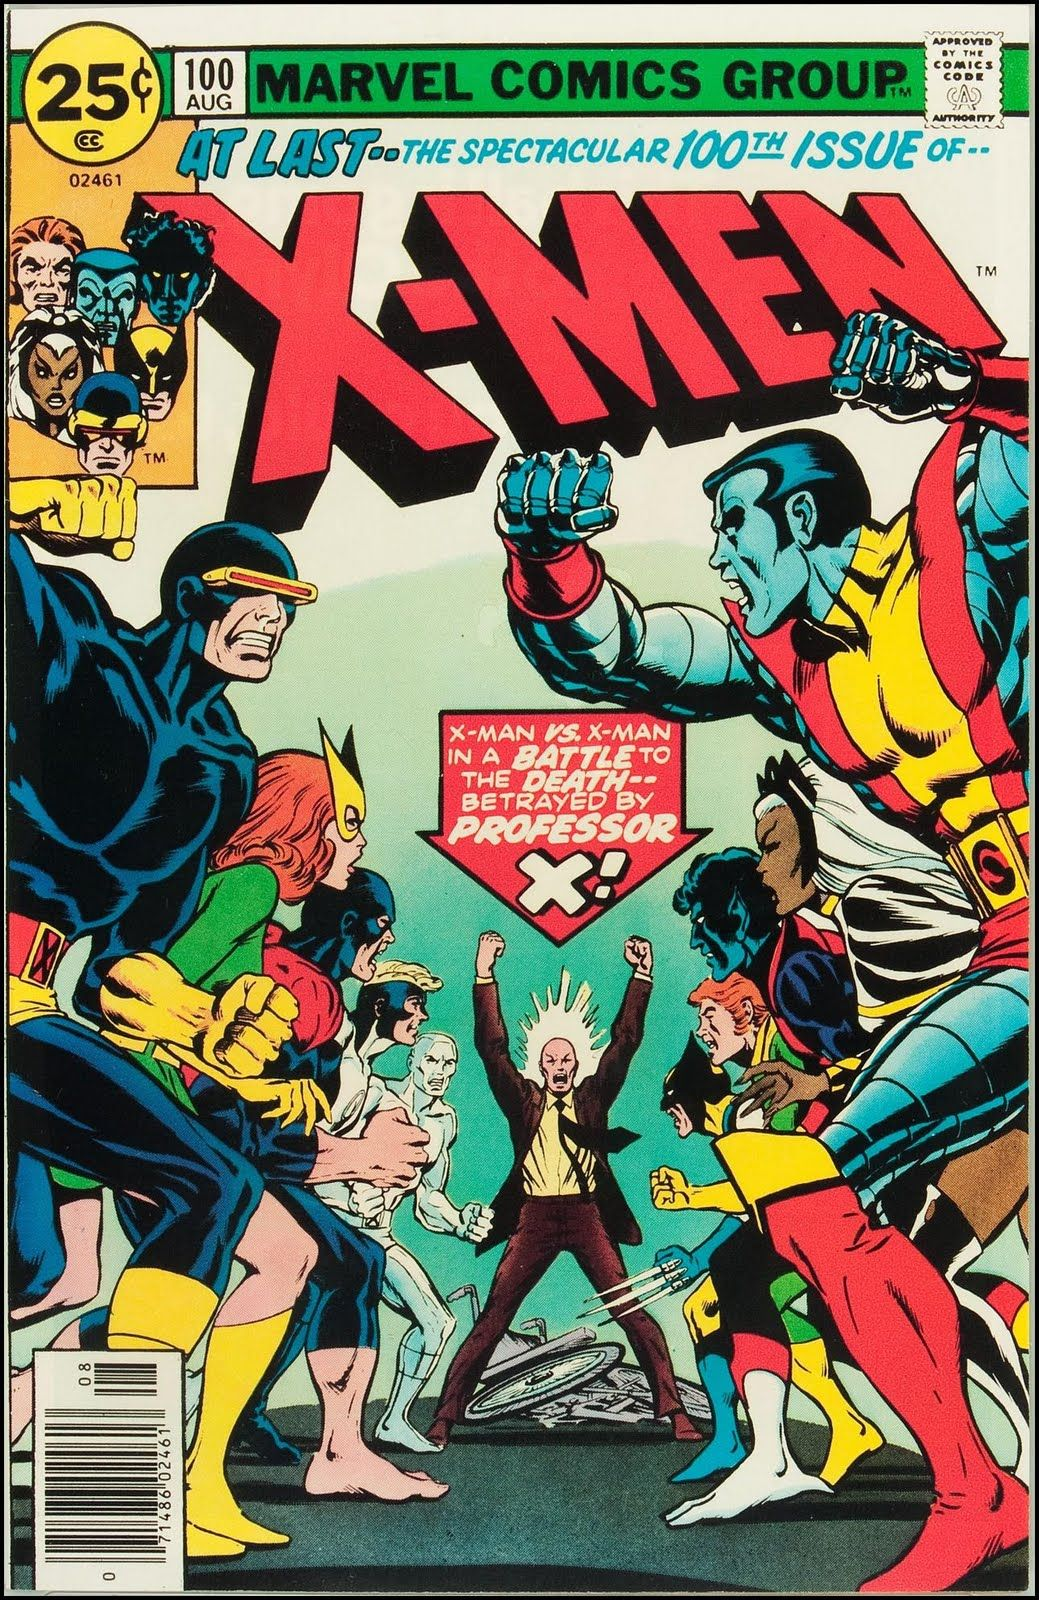 Uncanny X Men Vol 1 100 One Of My Favorite X Men Covers Marvel Comics Historietas Comic Comic Books